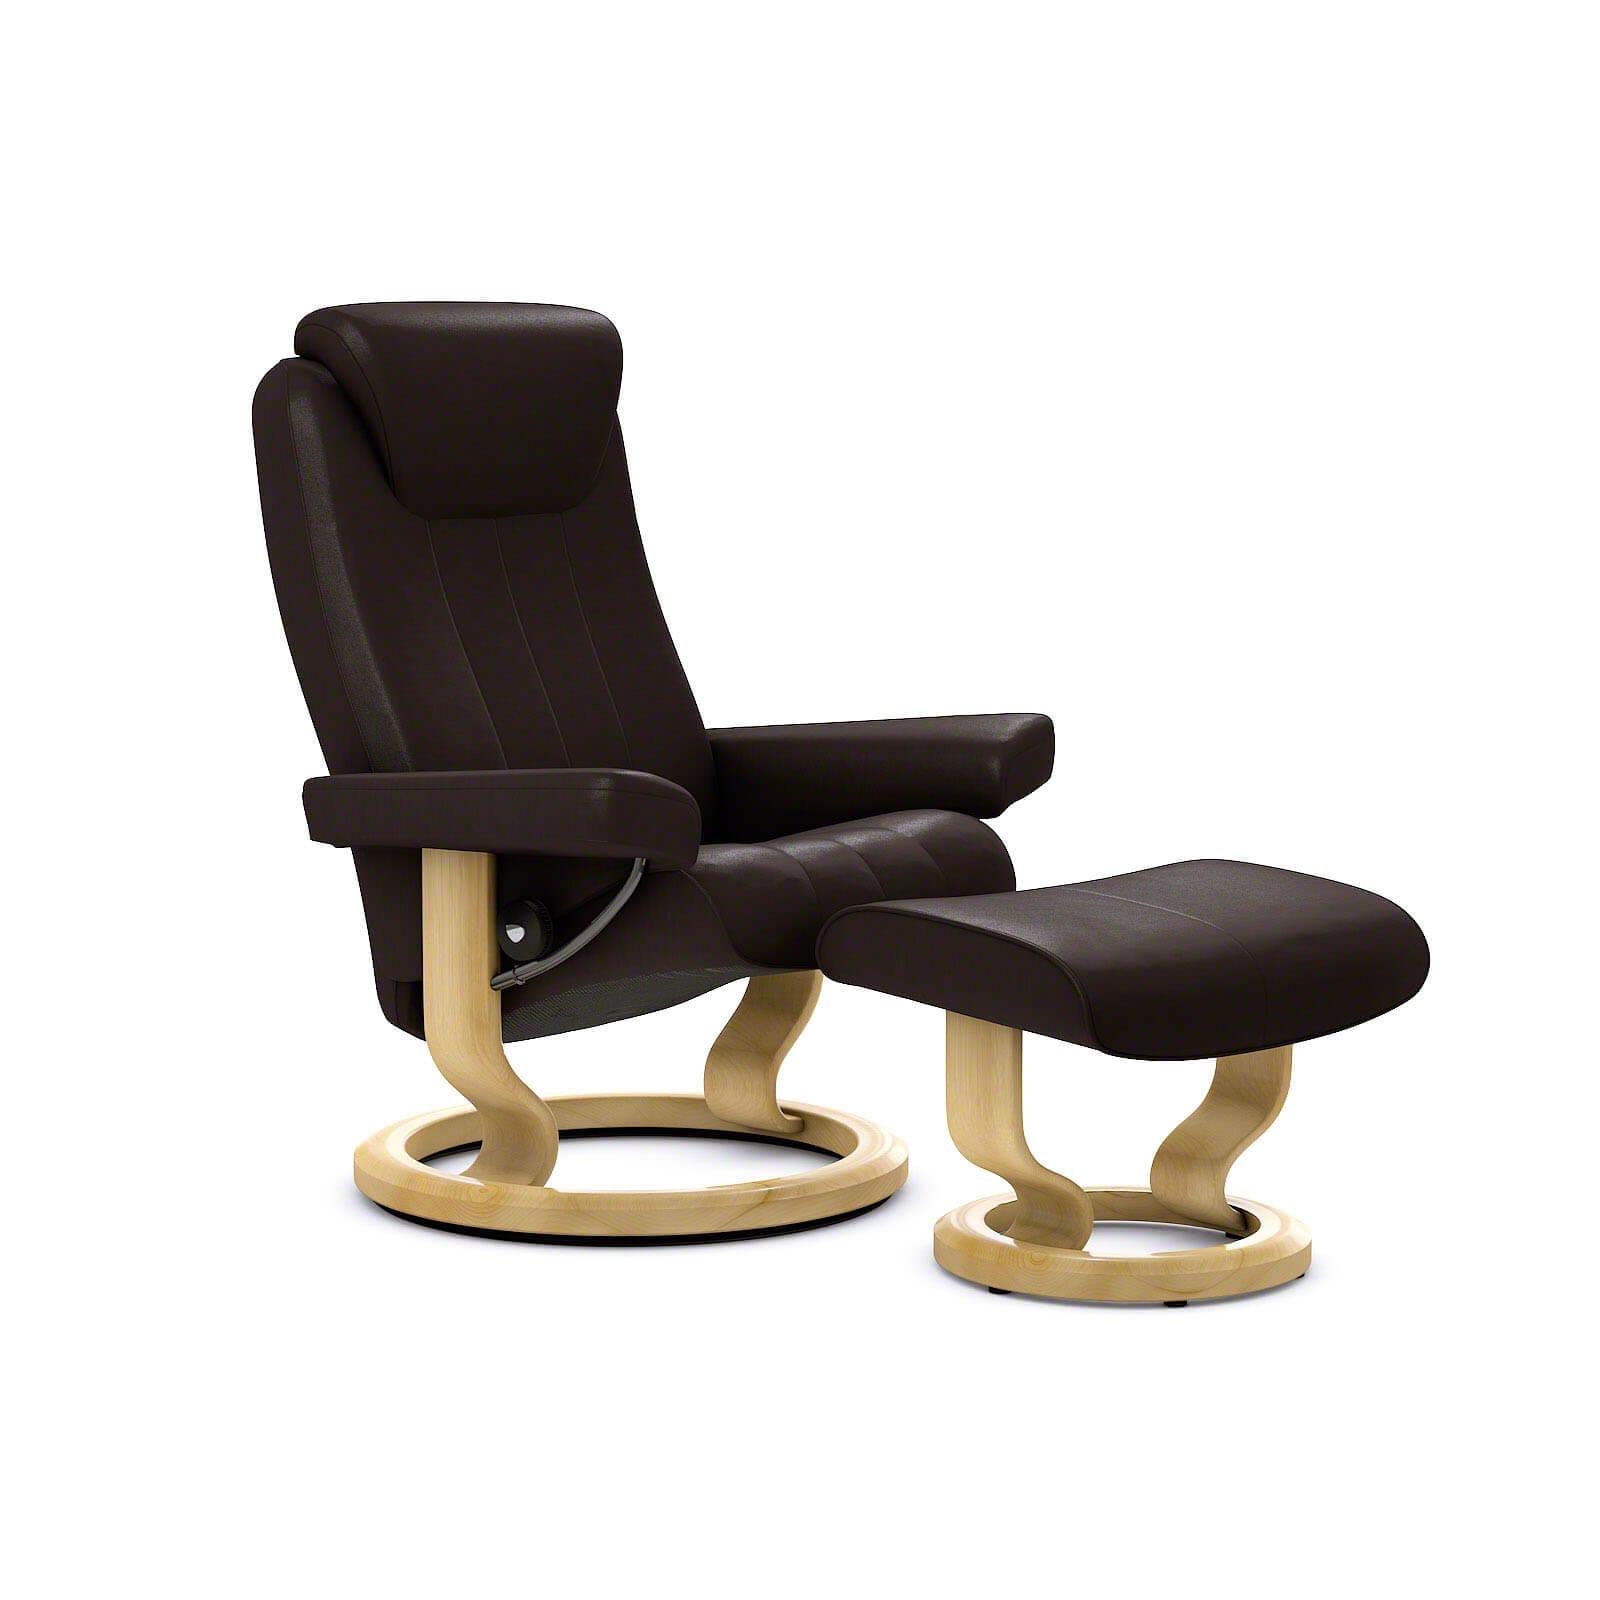 stressless bliss sessel paloma chocolate mit hocker stressless. Black Bedroom Furniture Sets. Home Design Ideas